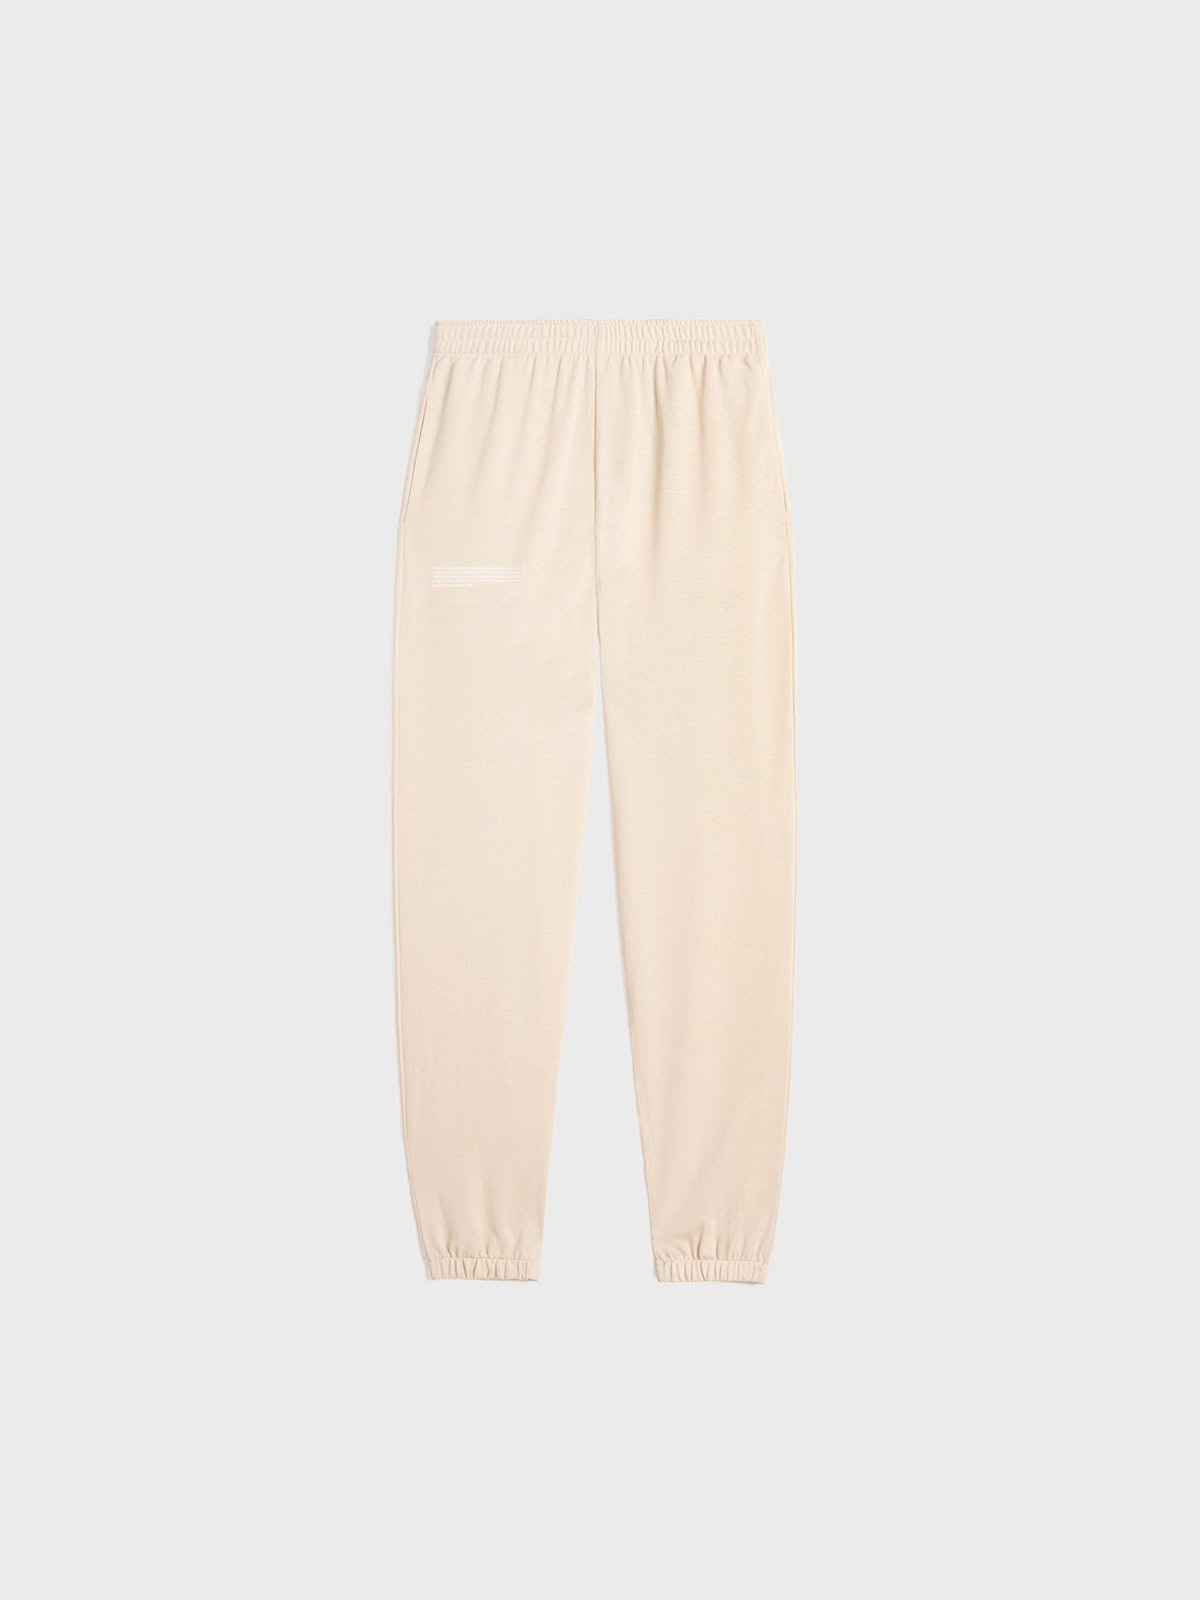 PLNTFIBER™ Track Pants from PANGAIA.